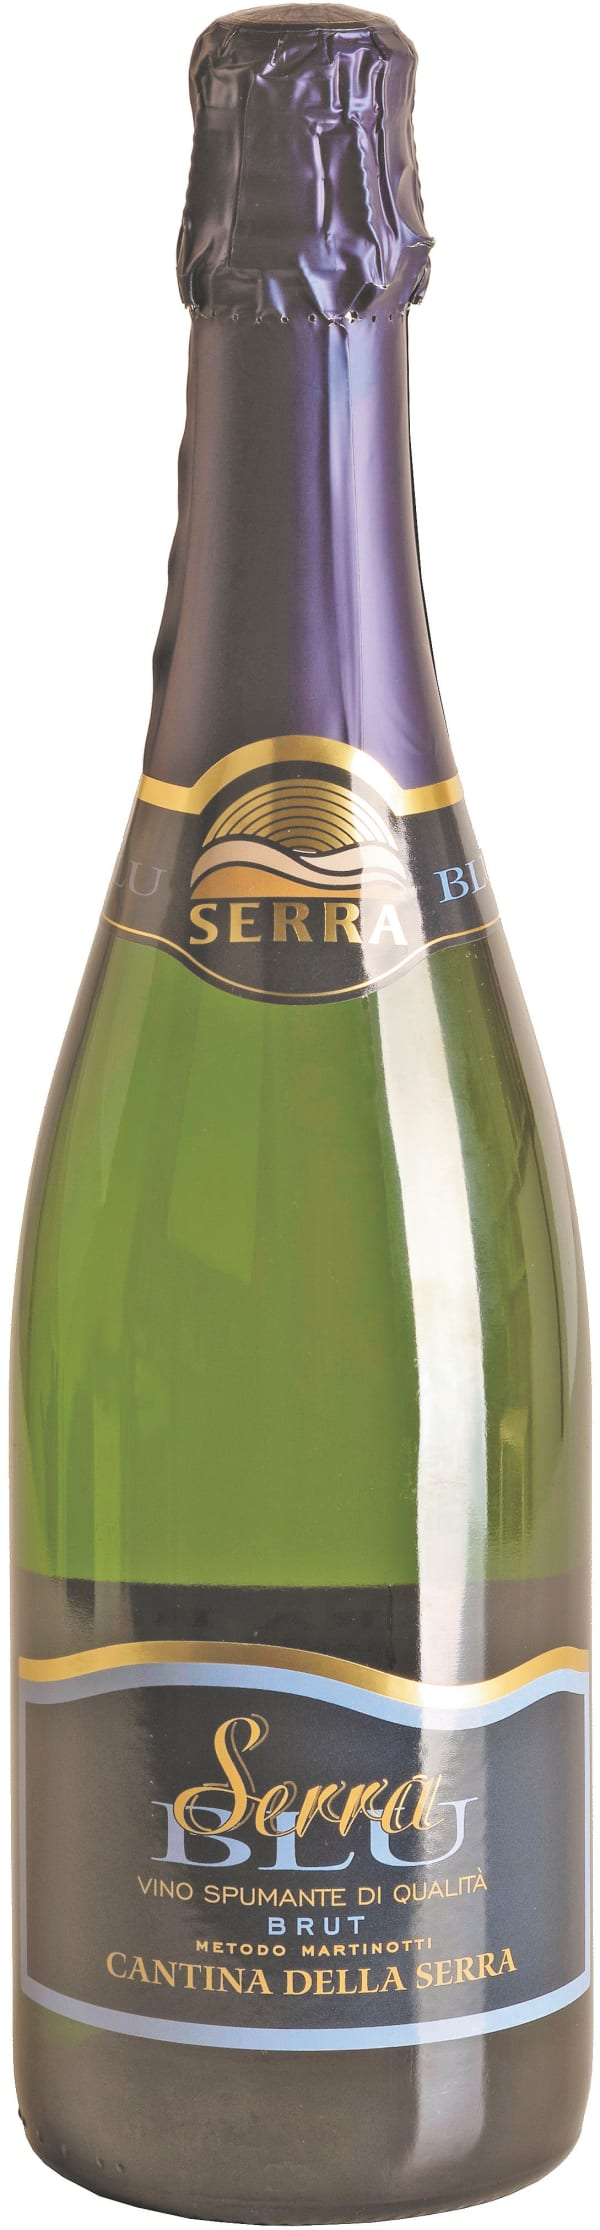 Cantina della Serra Blu Vino Brut 2017